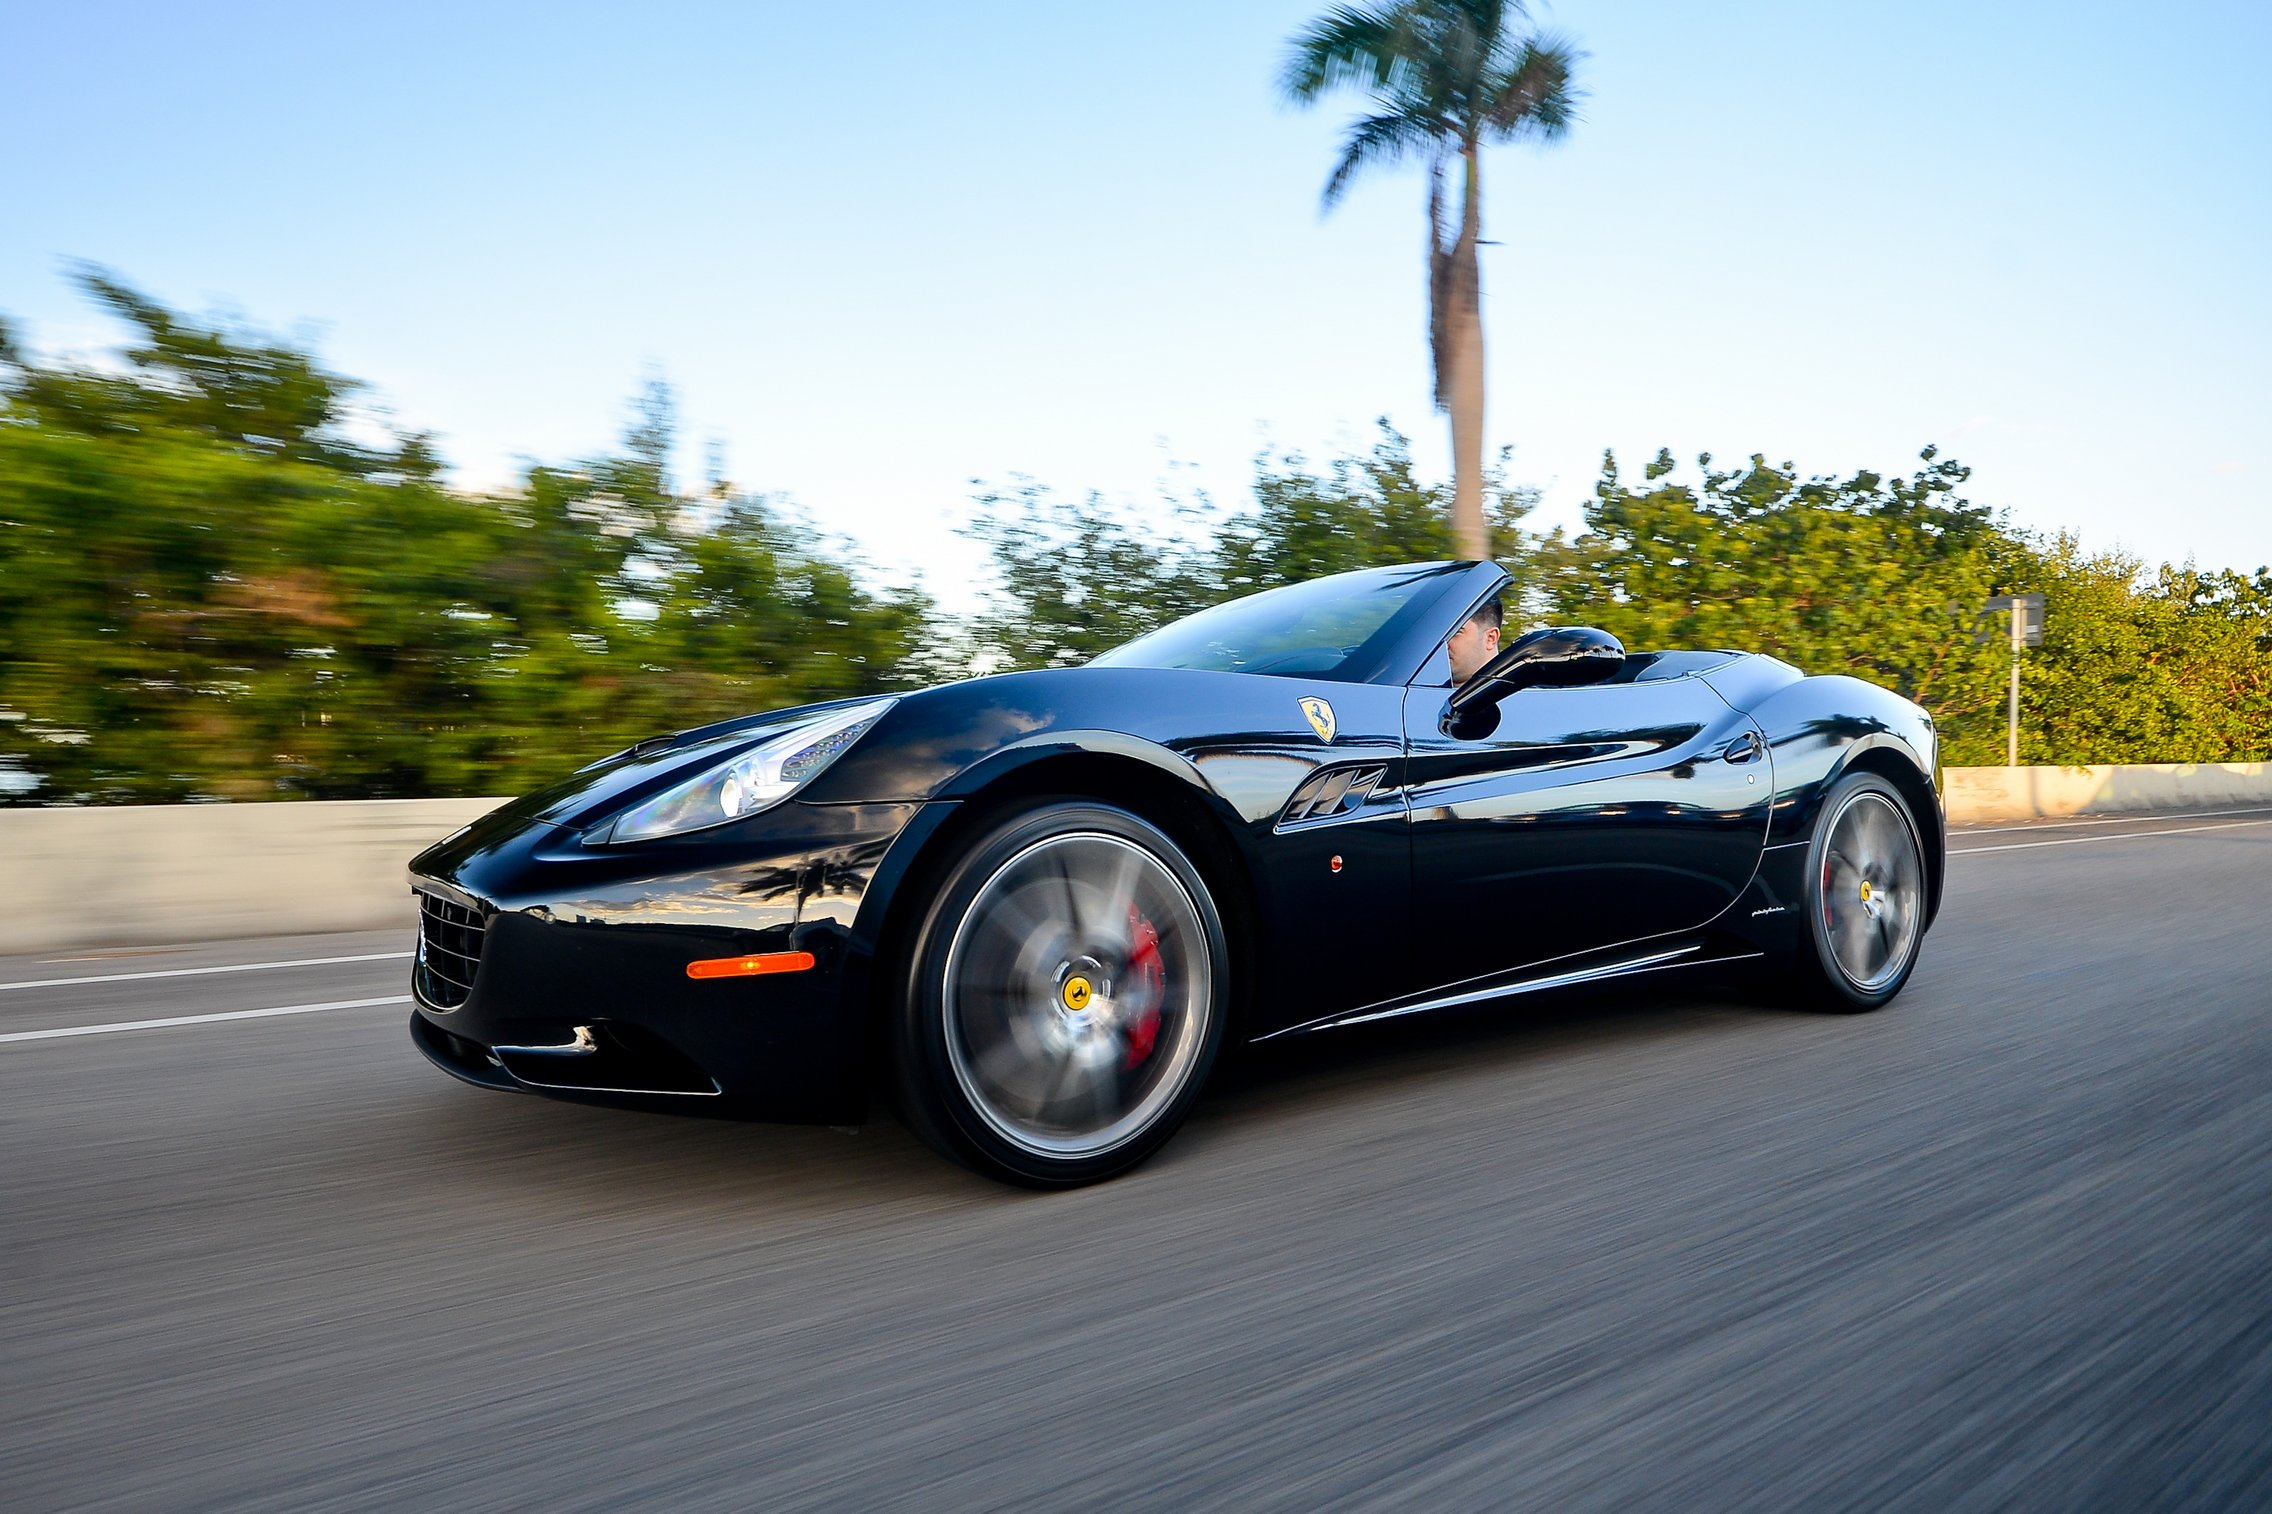 Ferrari California Rentals: Rent a Ferrari California in Miami, Florida.